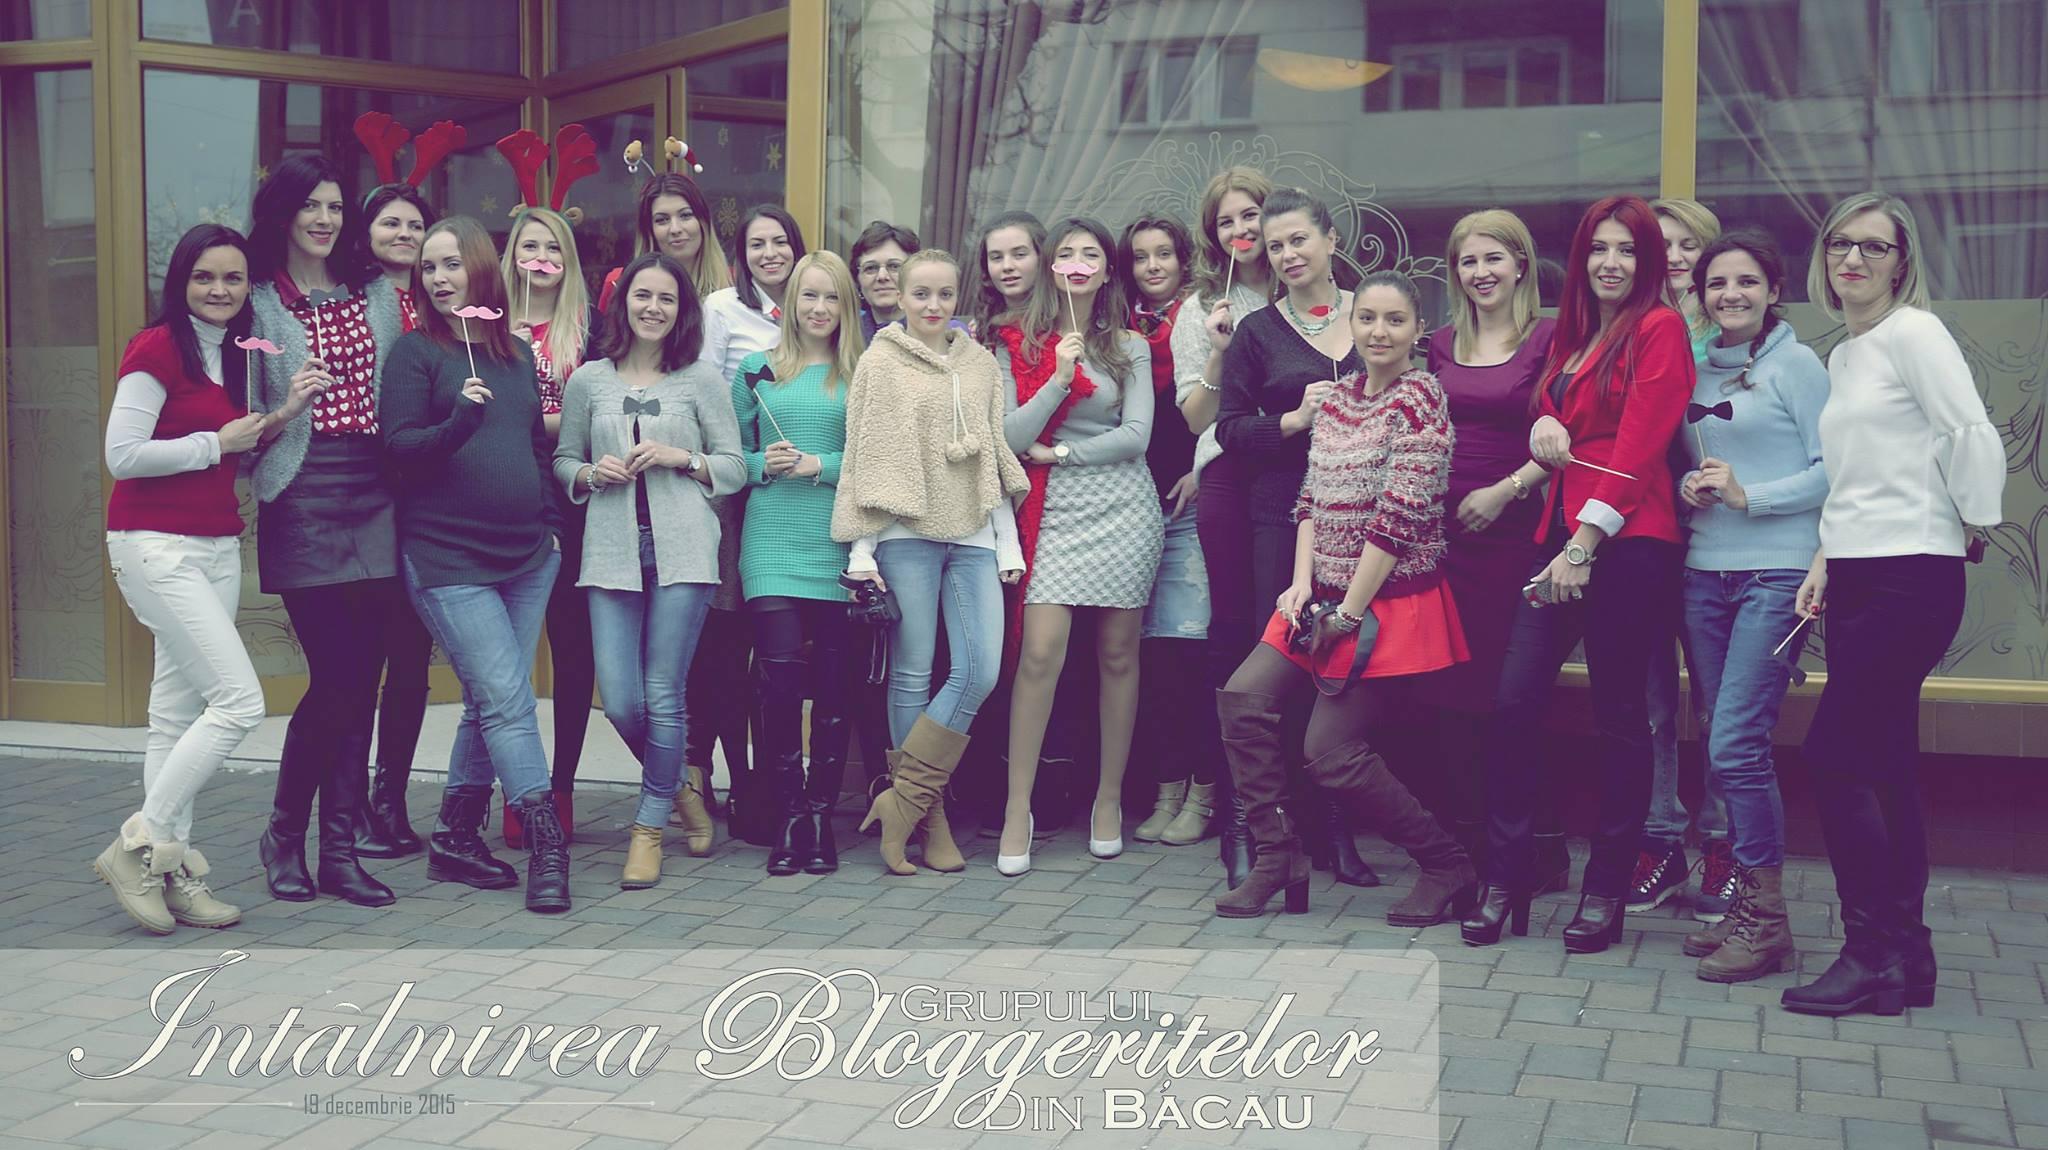 #bloggeriteBacau4 intalnirea bloggeritelor din judetul bacau